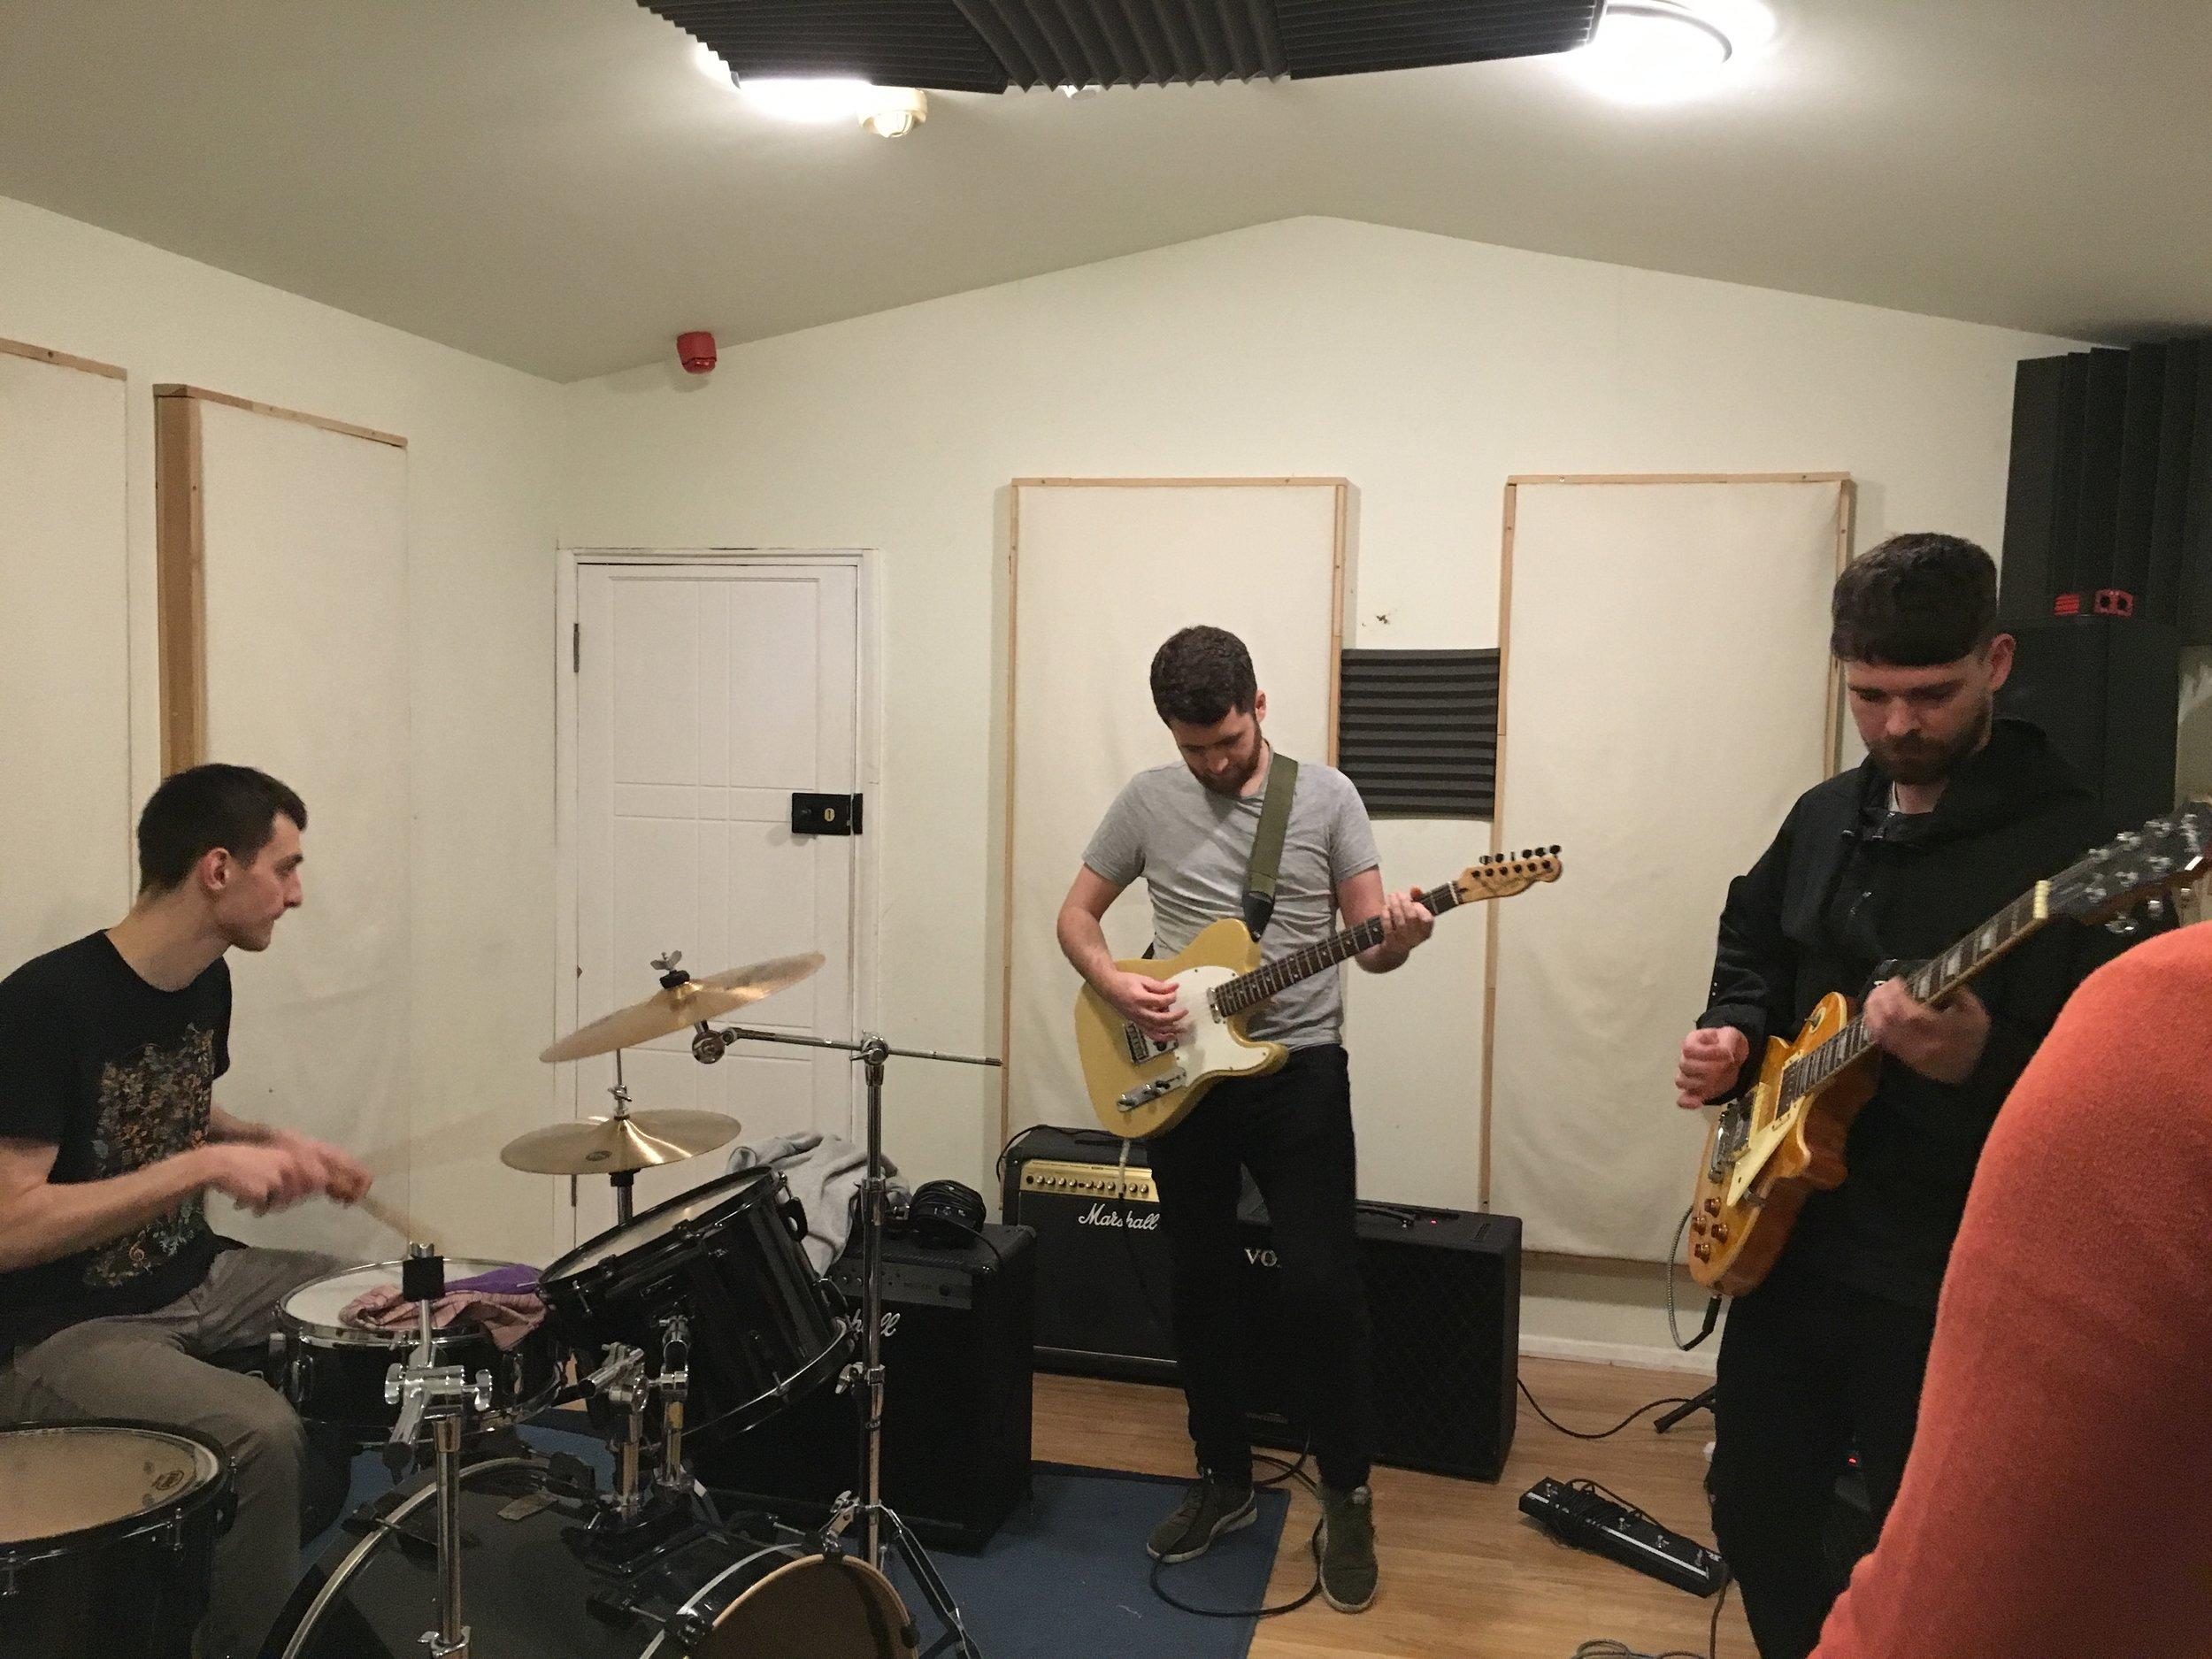 Matt Ruminski and friends enjoying the studio quality acoustics of our Live Room